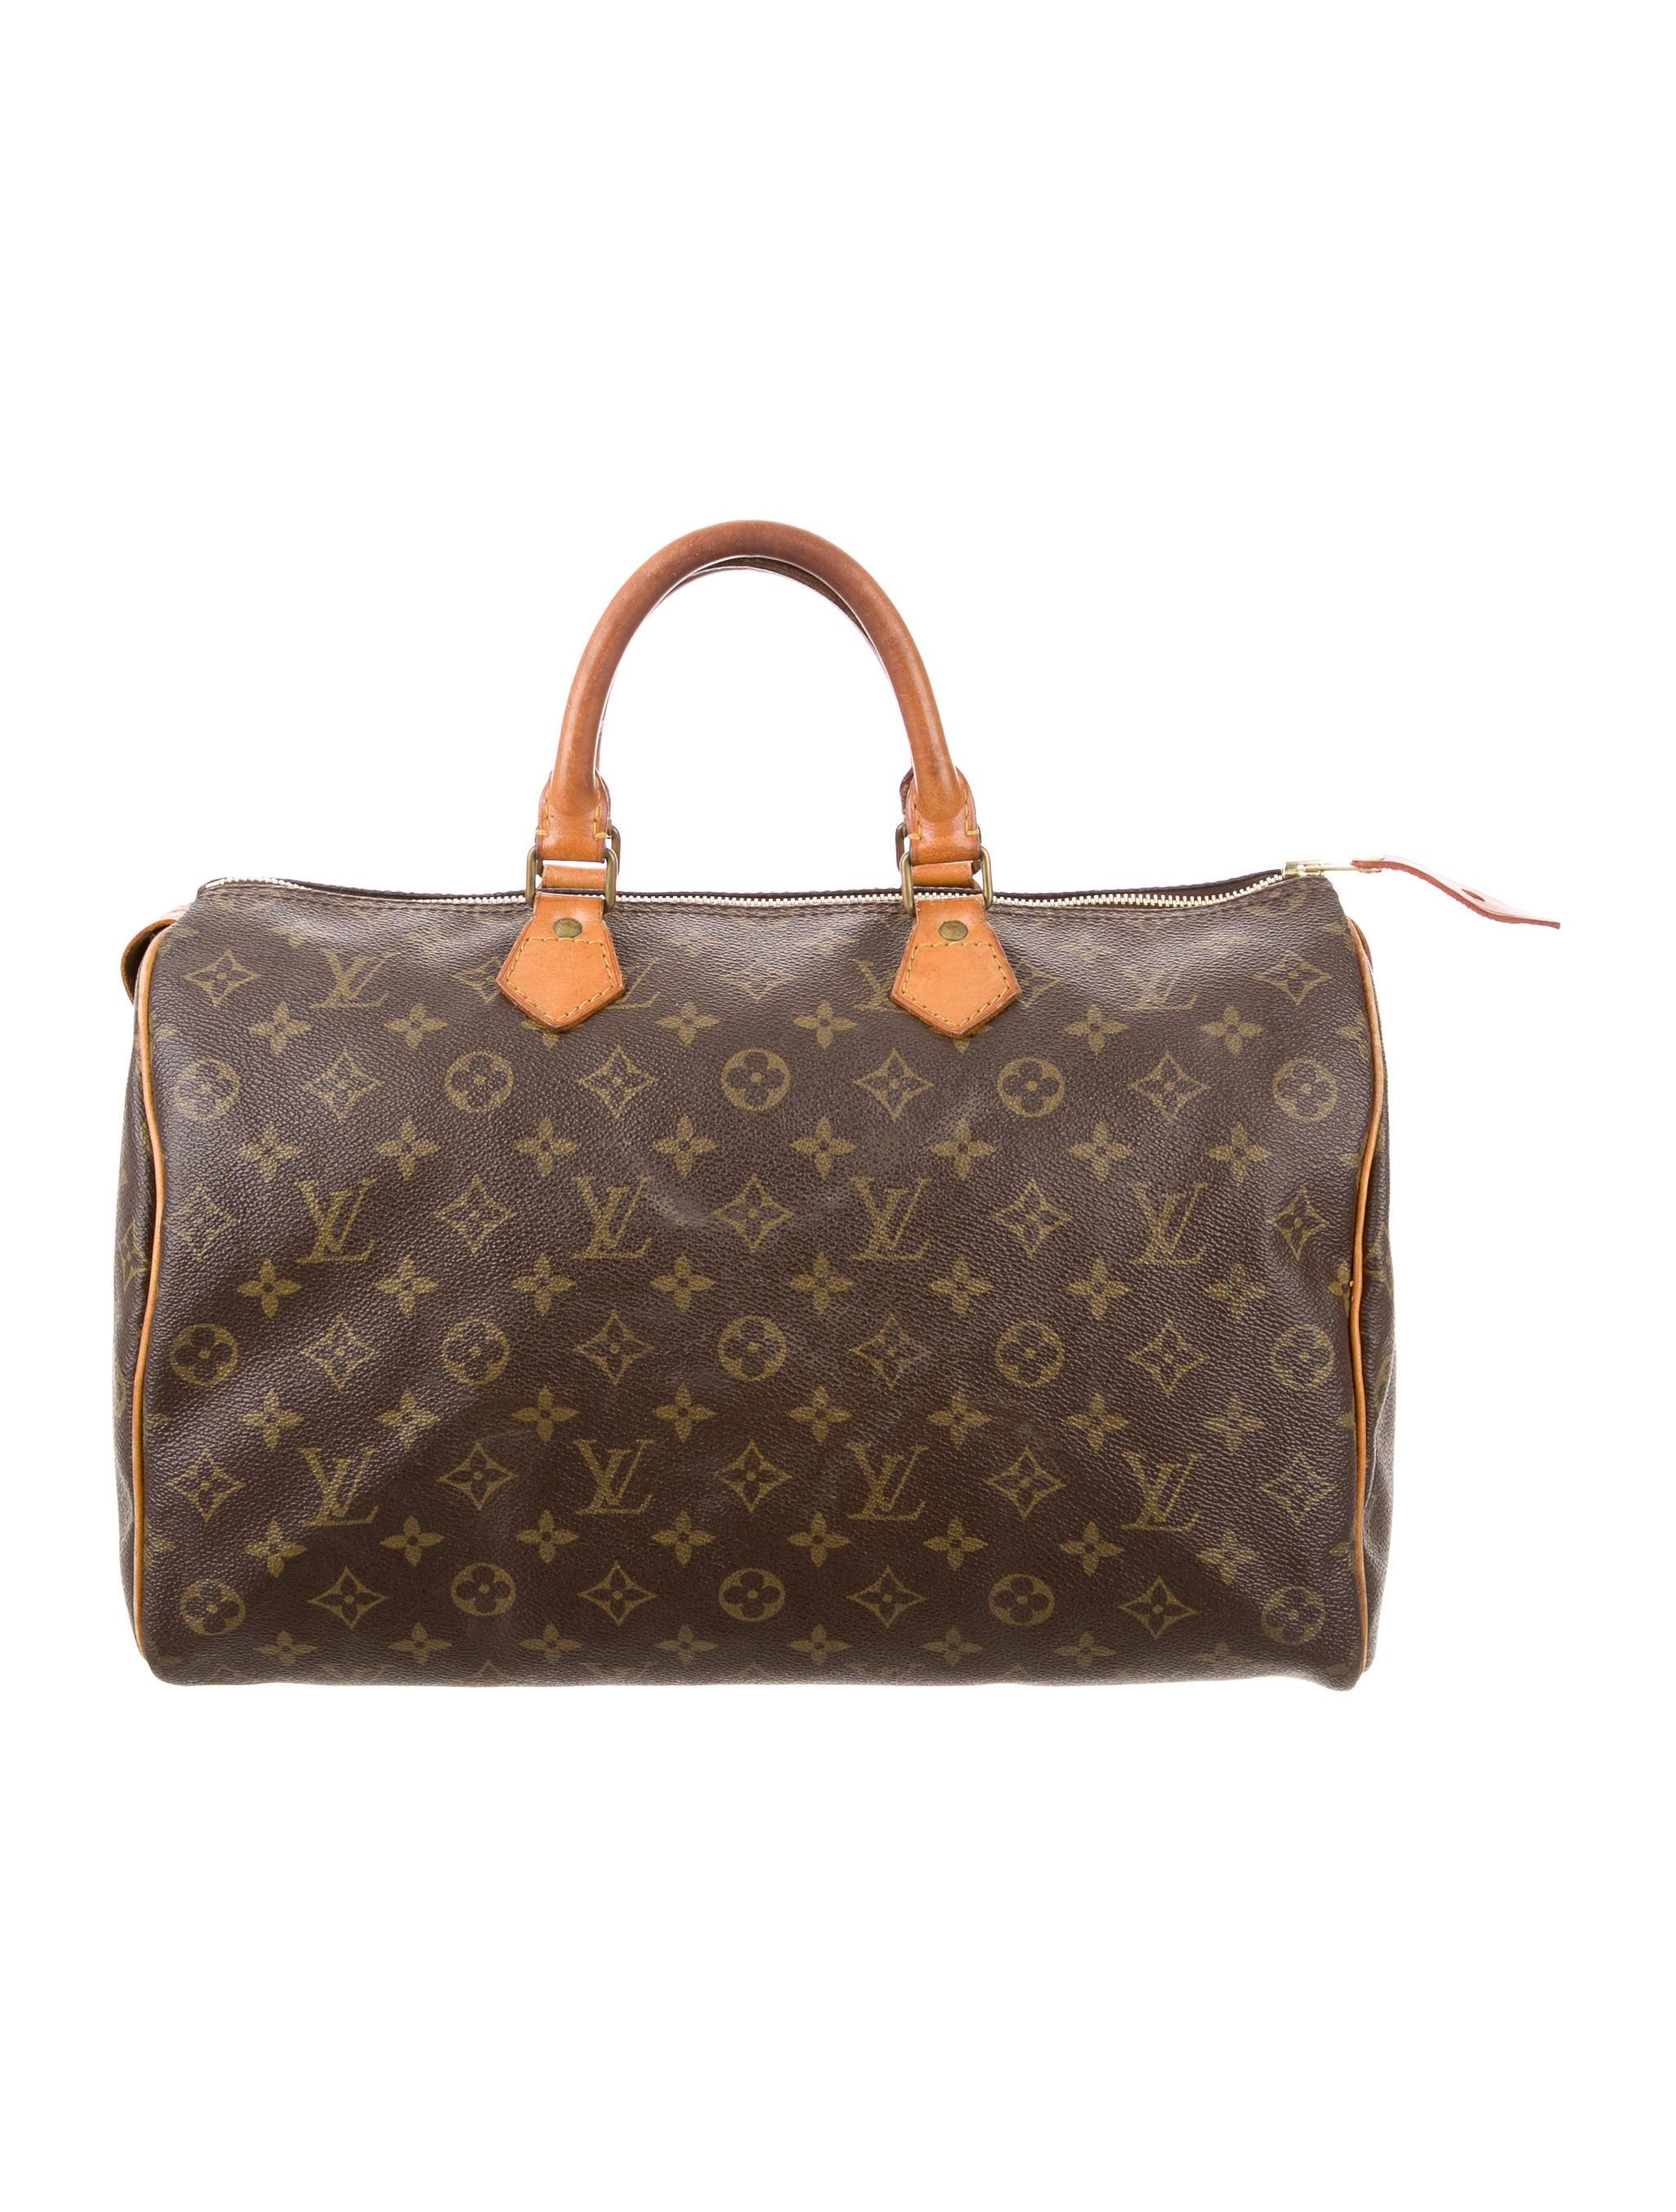 Louis vuitton monogram speedy 35 handbags lou107139 for Louis vuitton miroir speedy 35